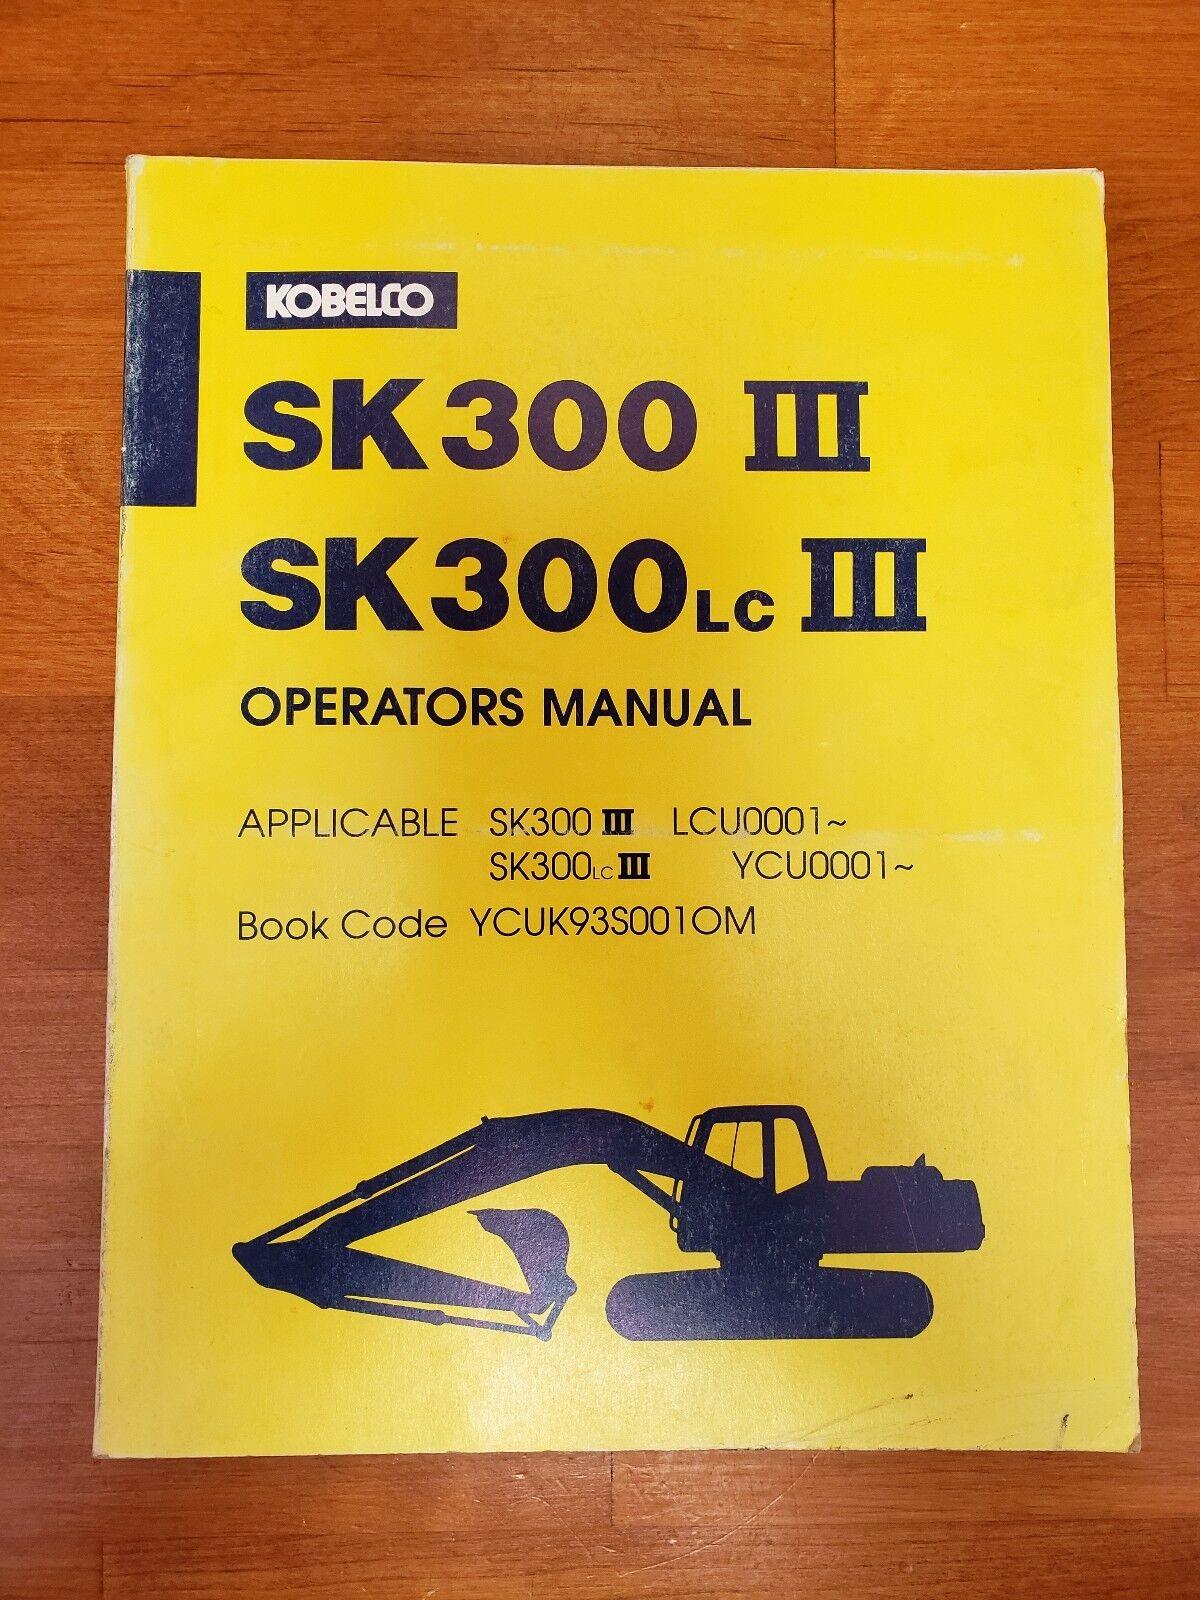 KOBELCO SK300 III SK300LC III OPERATOR'S MANUAL S/N LCU0001-- & YCU0001 --  | eBay